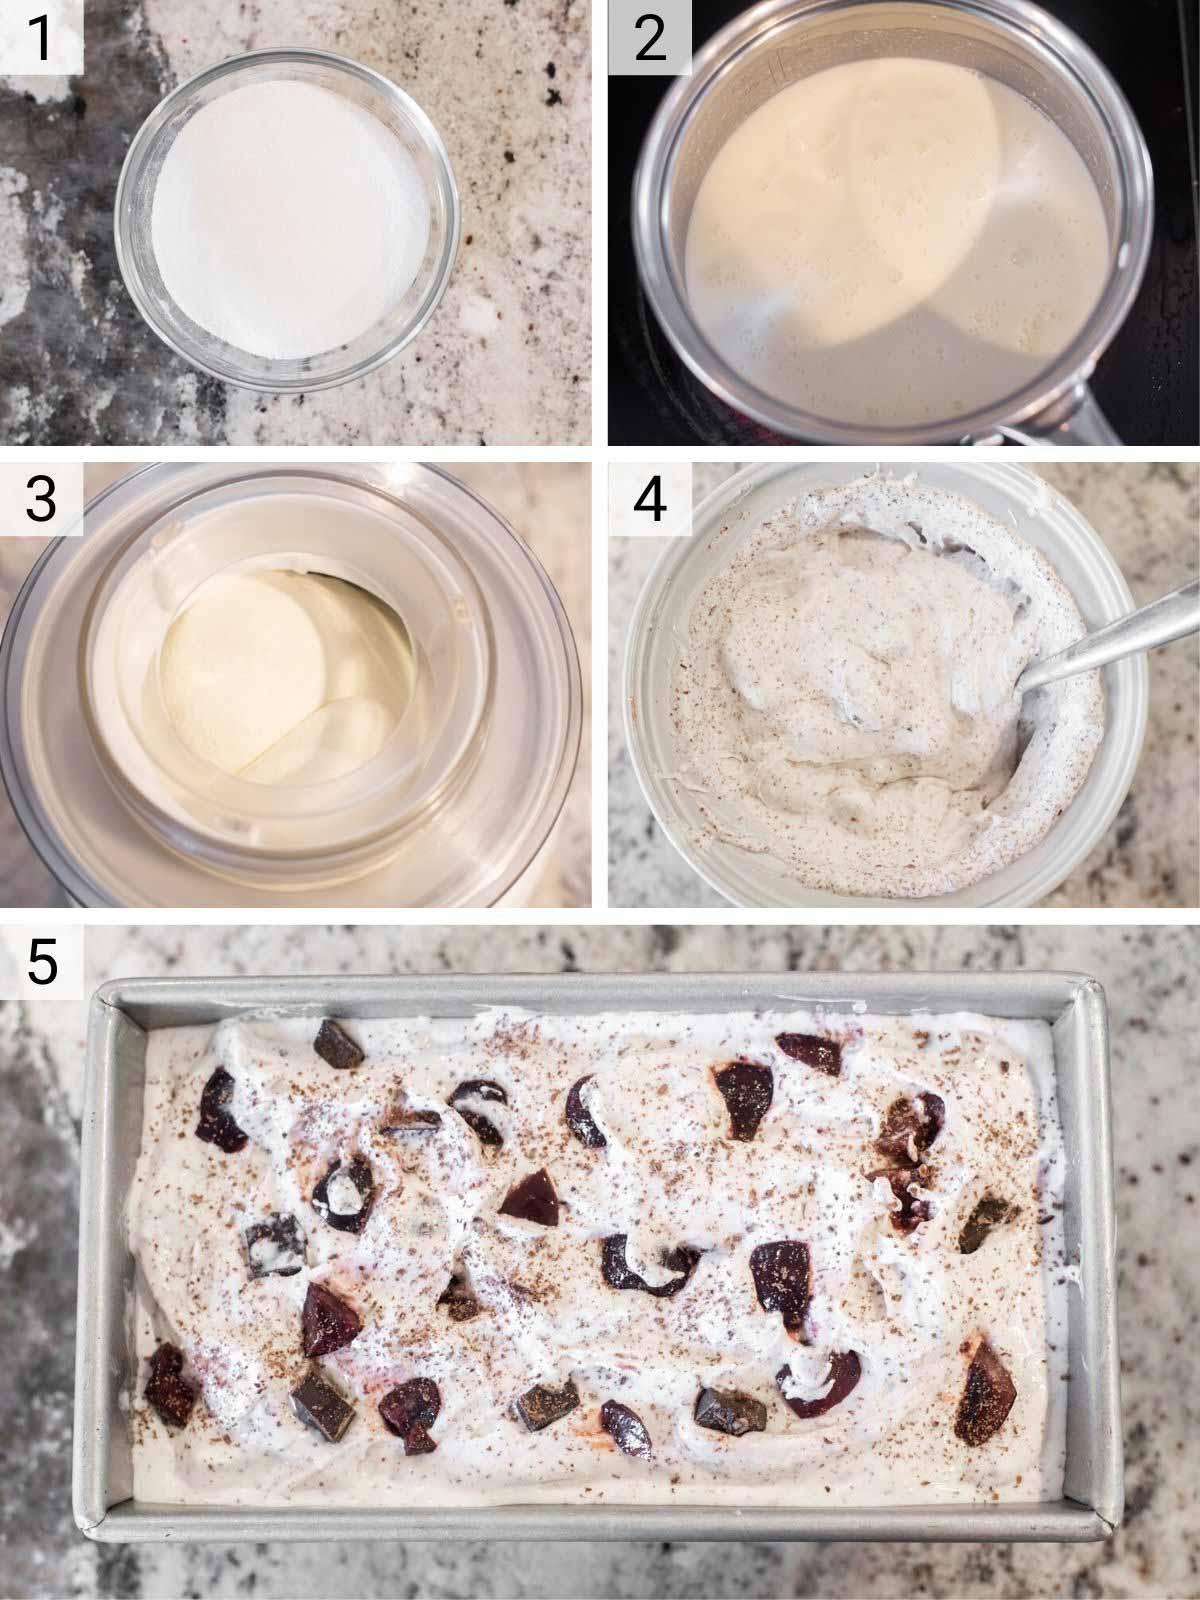 process shots of how to make cherry chocolate chunk ice cream